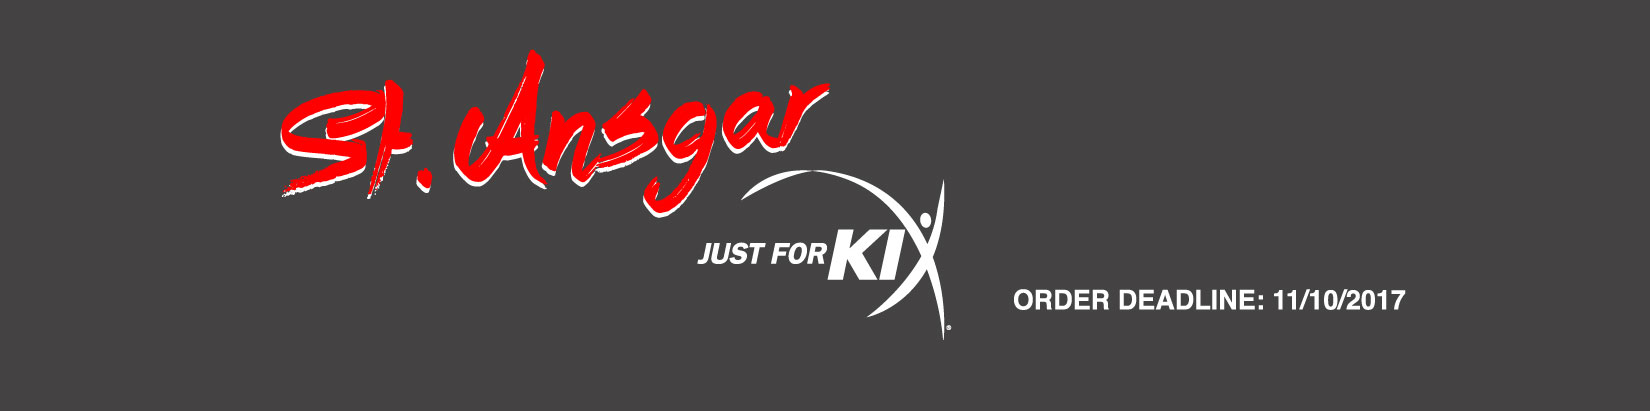 St. Ansgar Just For Kix